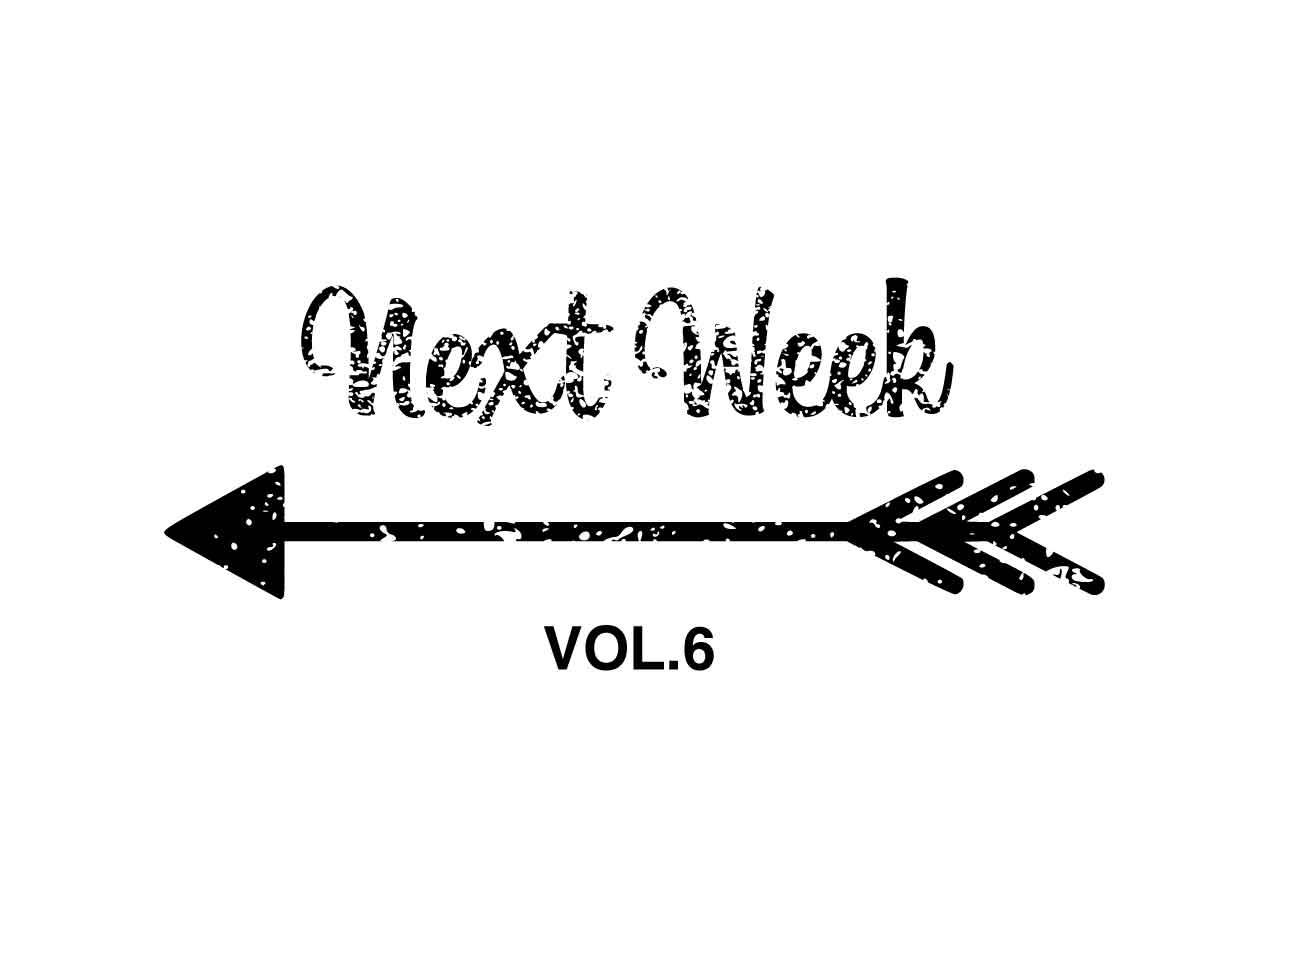 nextweek2